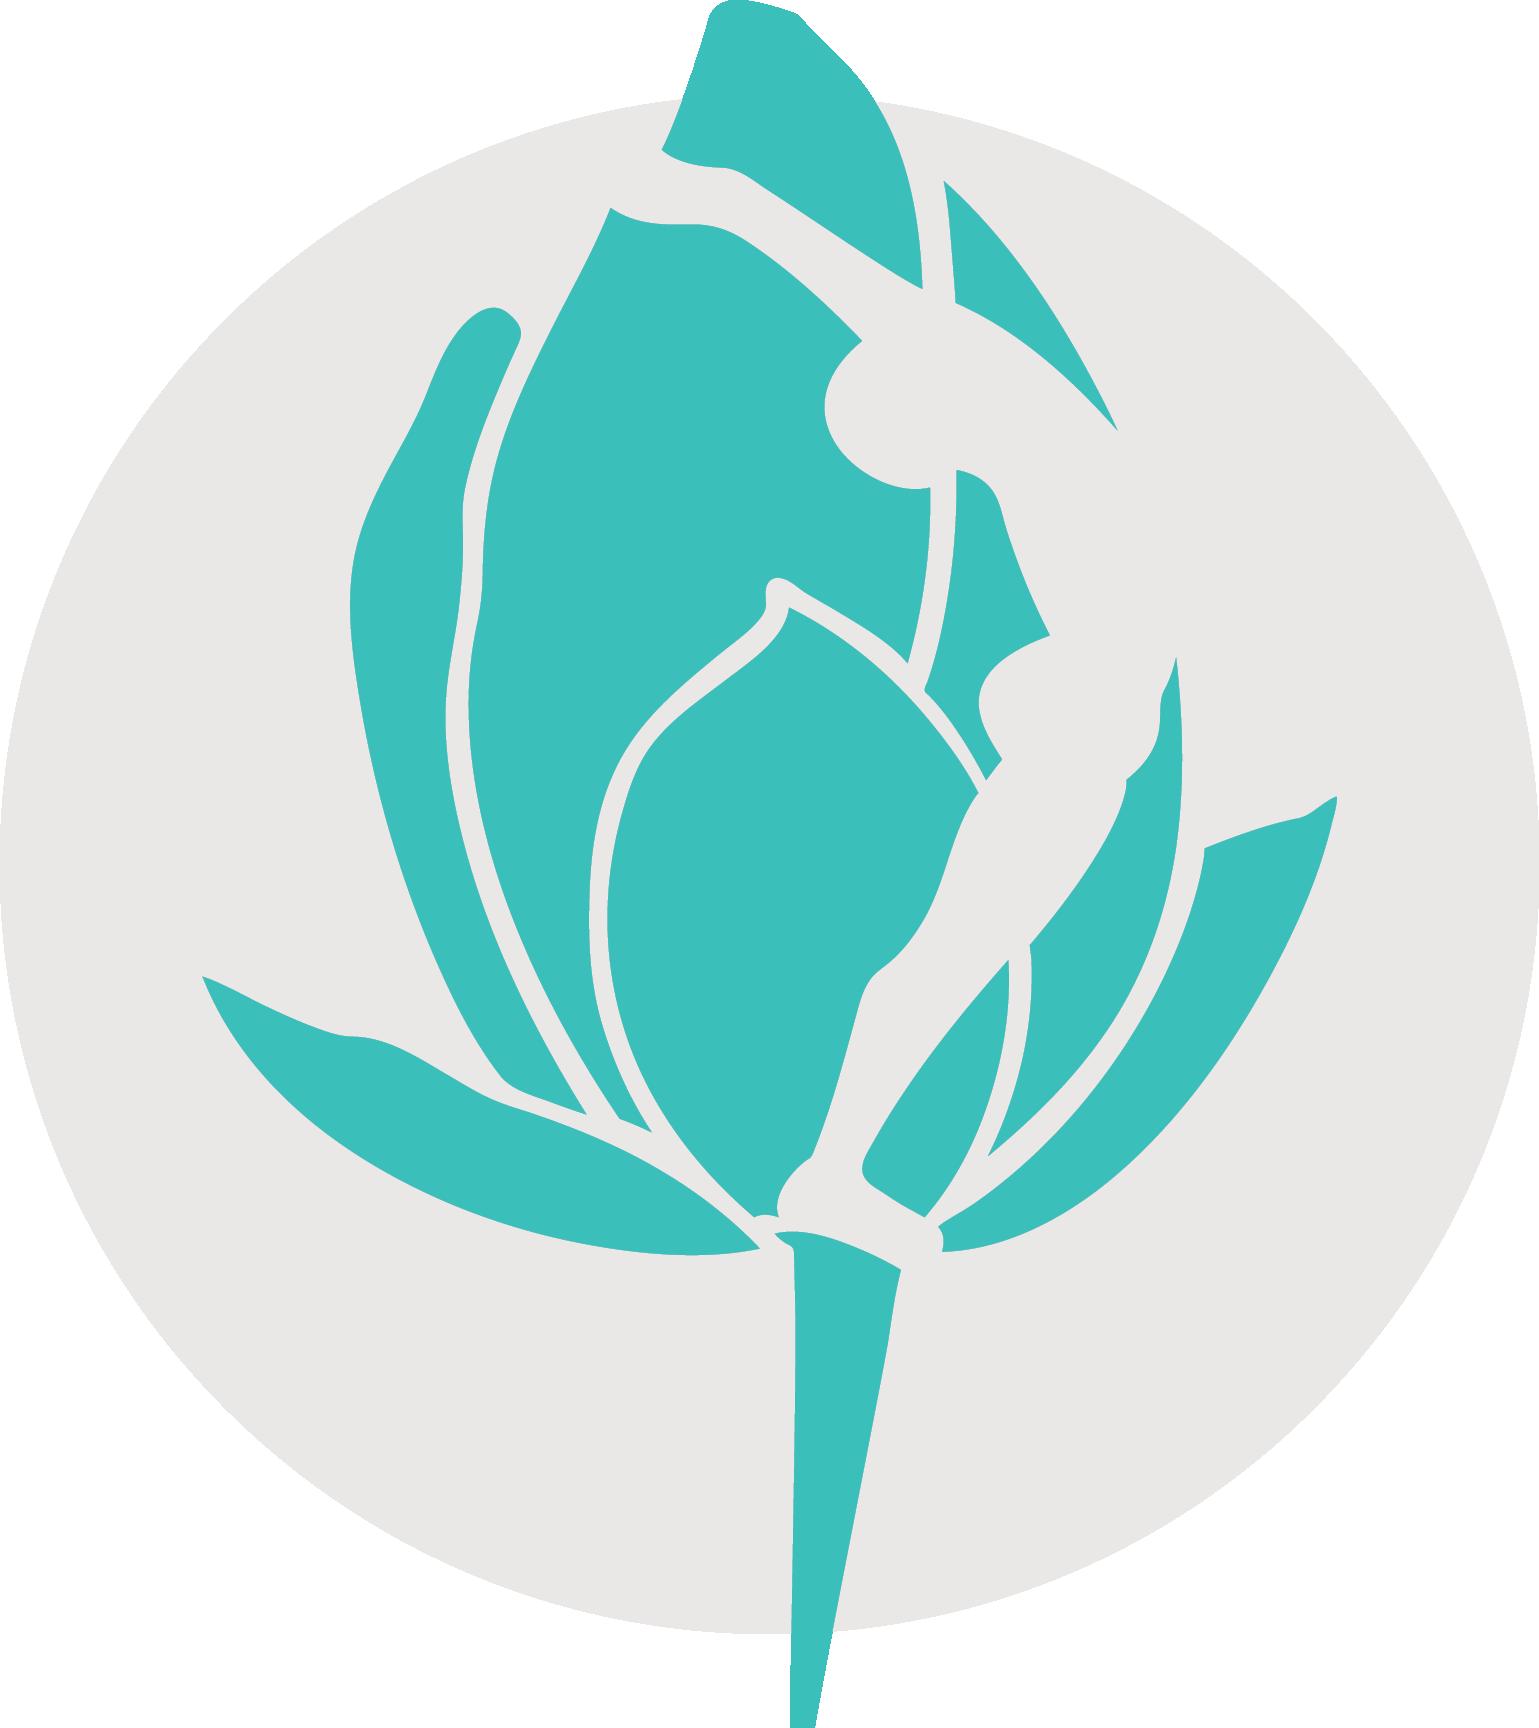 Yoga santosha icon teal